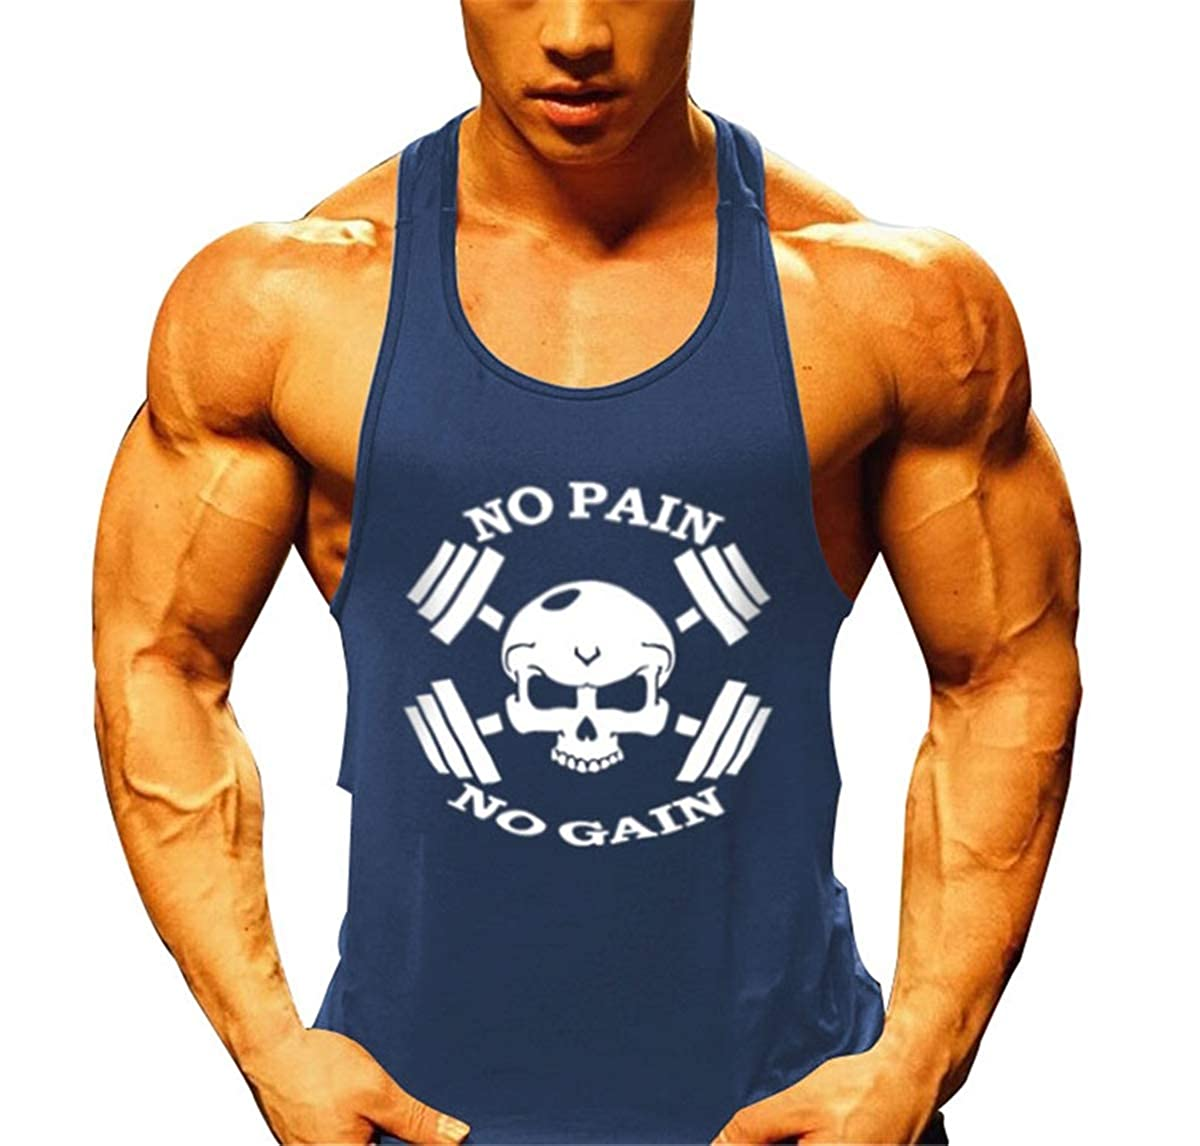 KODOO No Pain No Gain Musculation Homme Gym D/ébardeur sans Manche Maillot de Corps Tank Top Stretch Workout Fitness Stringer